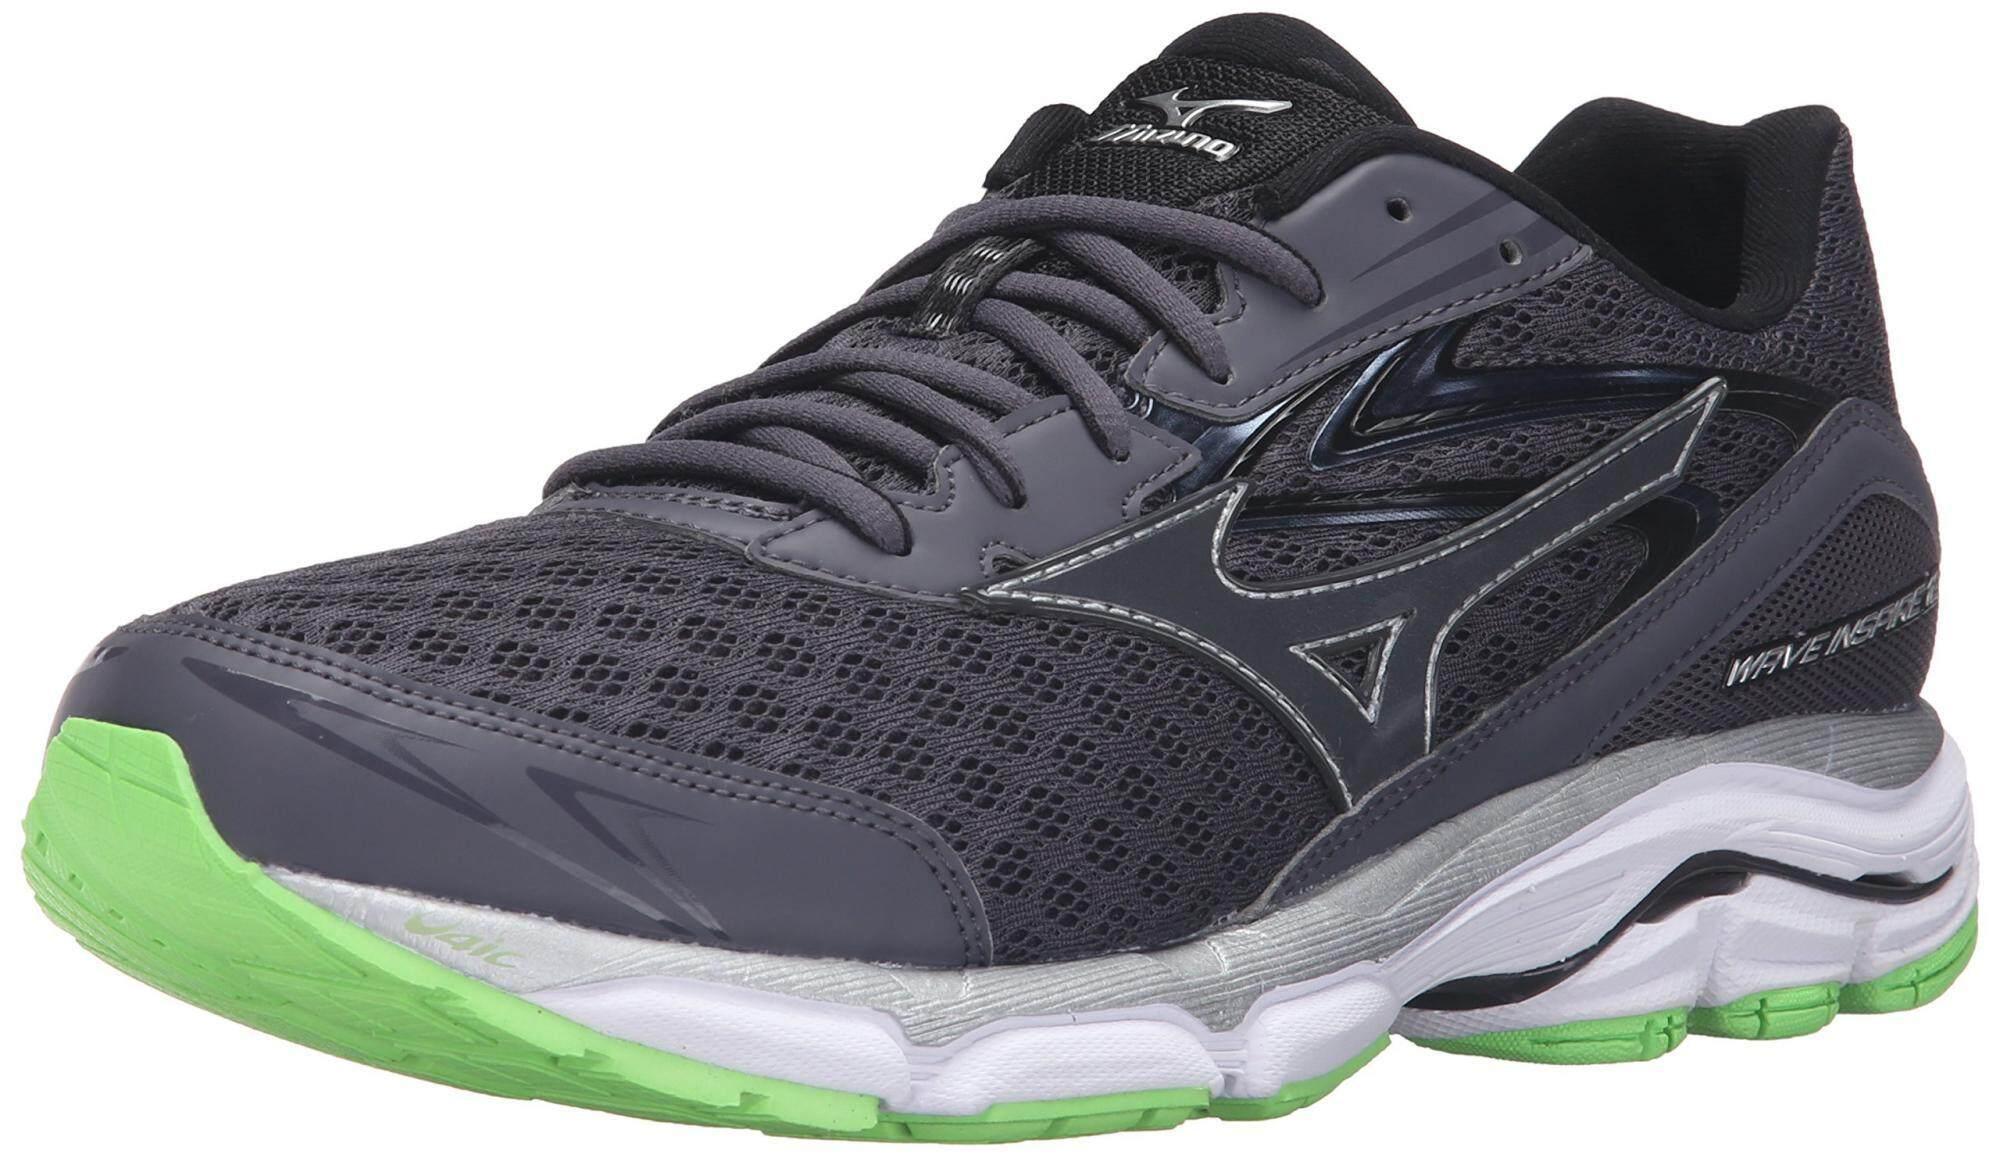 Mizuno Men's Wave Inspire 12 Running Shoe, Periscope/Green Flash, 8 D US